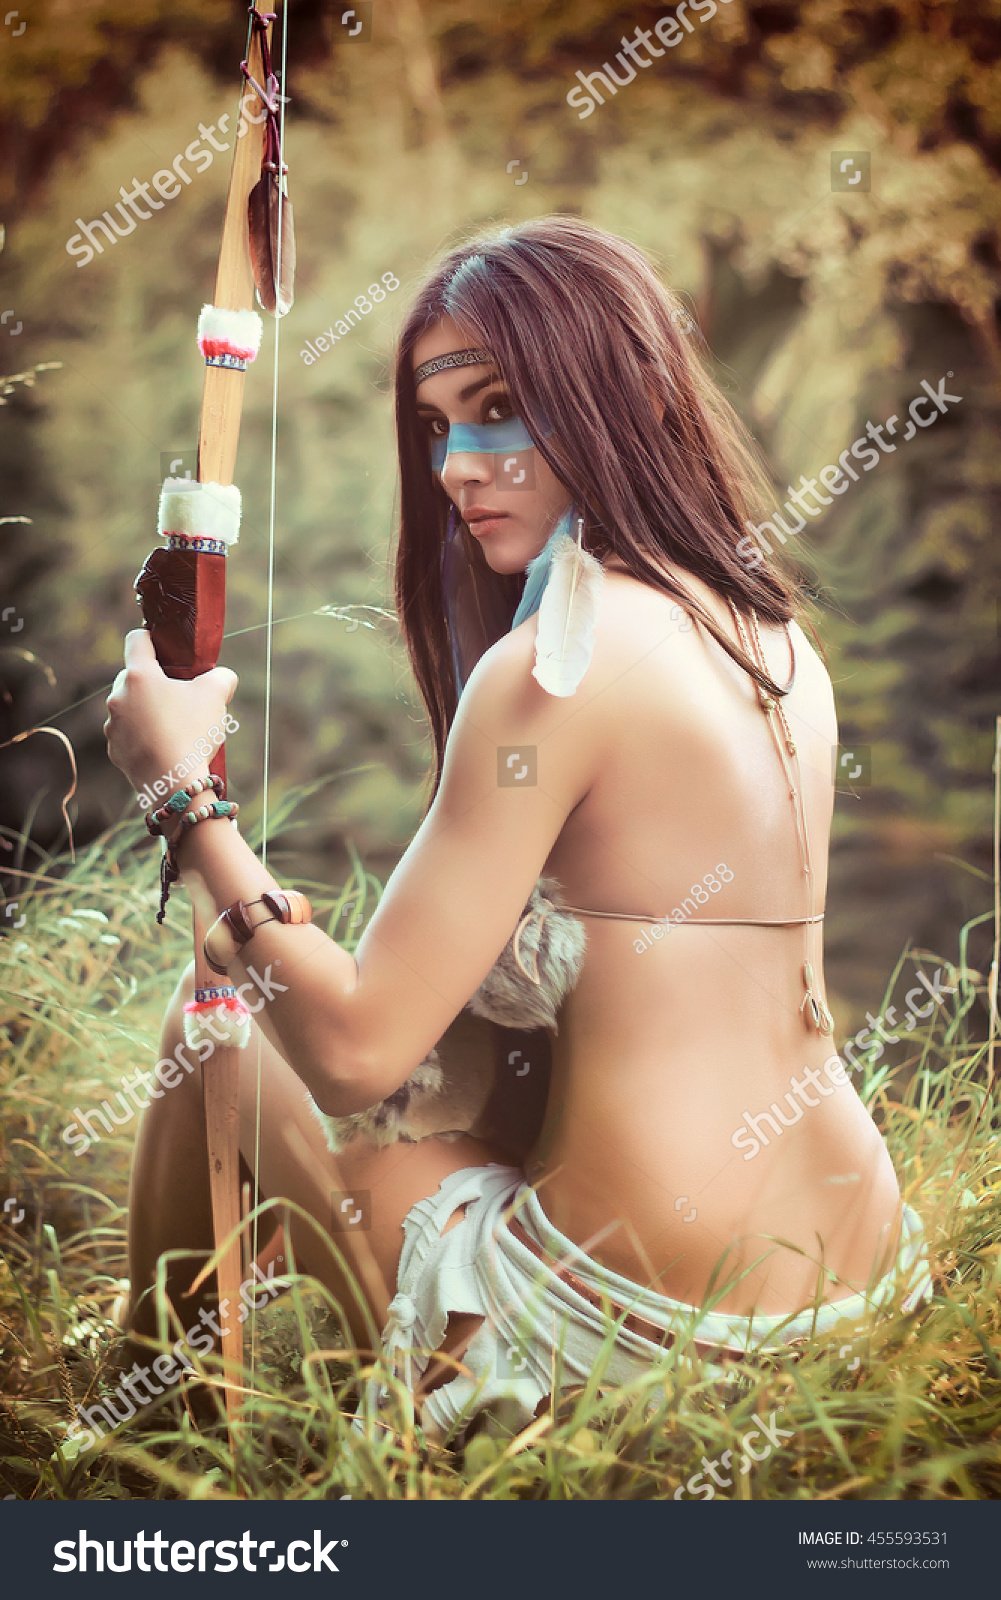 Hot native american girls naked